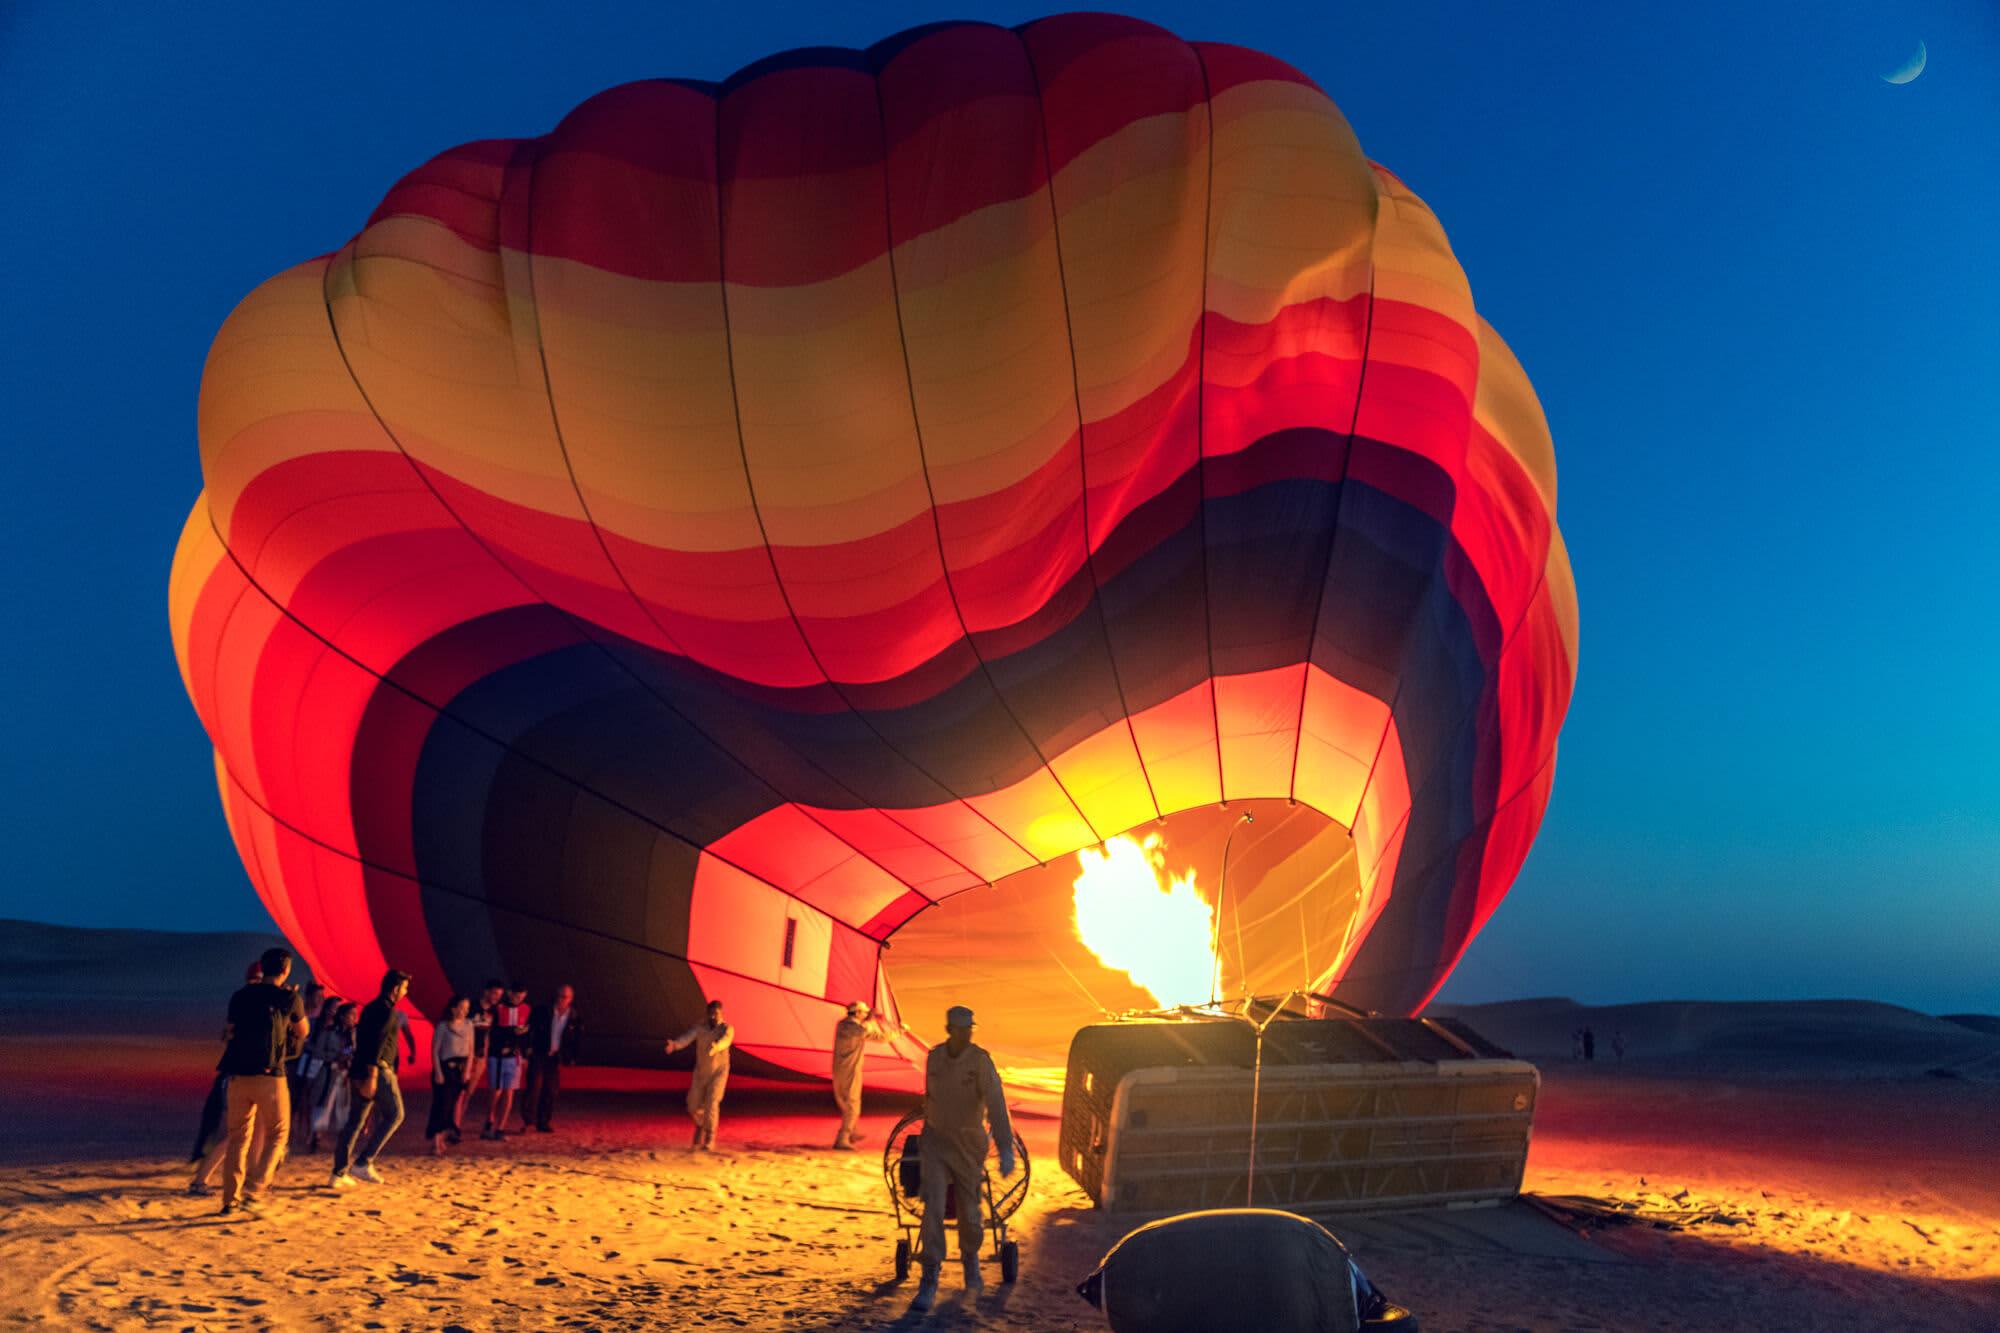 Balloon Adventures Dubai Tickets